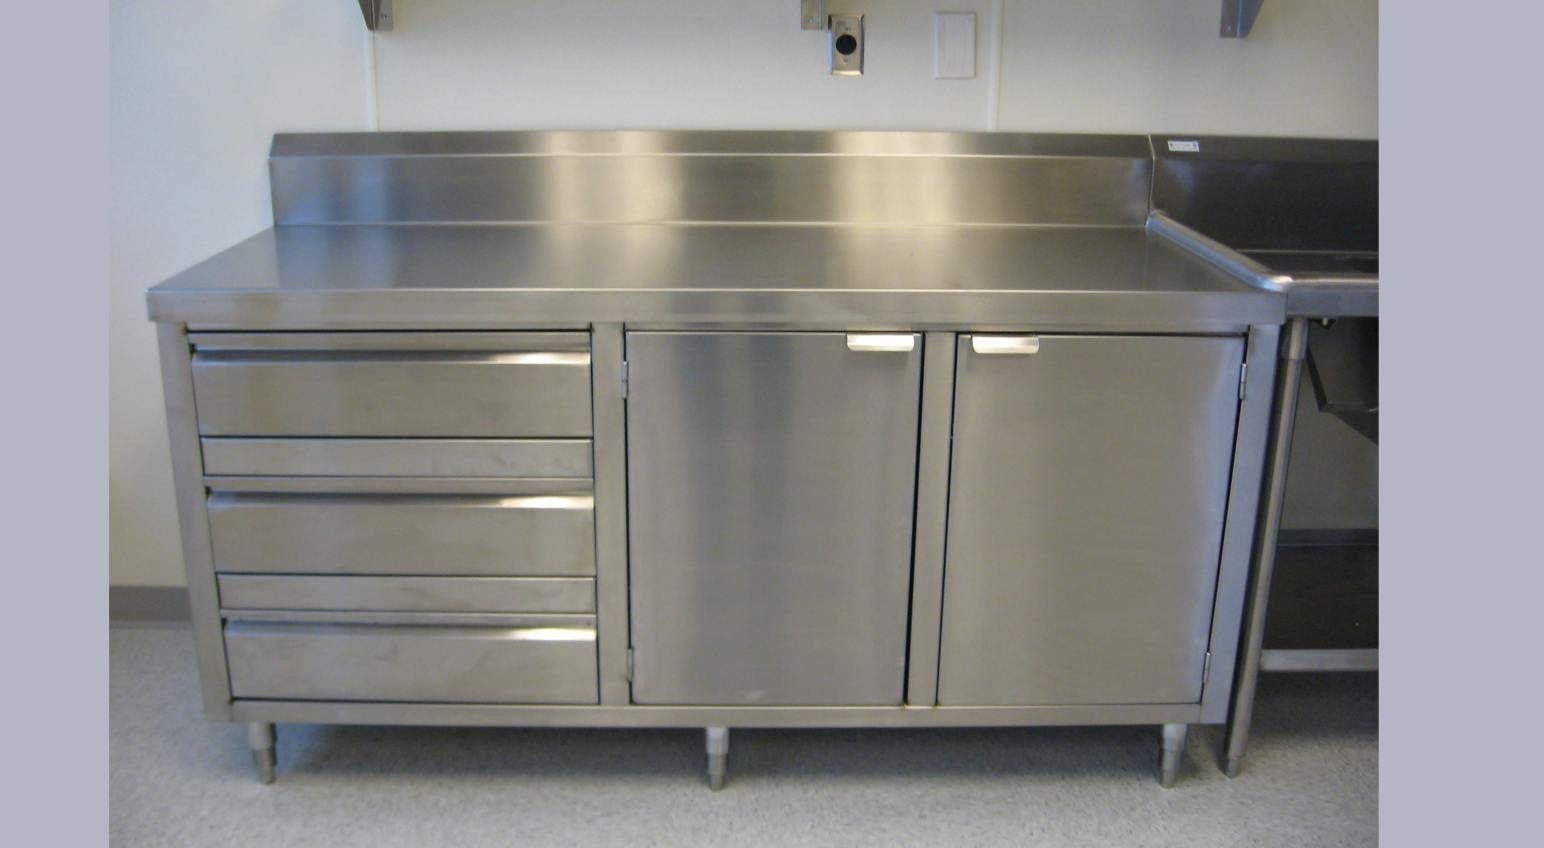 99 Metal Sink Base Cabinet Kitchen Floor Vinyl Ideas Check More At Http Www Metal Kitchen Cabinets Stainless Steel Kitchen Cabinets Steel Kitchen Cabinets